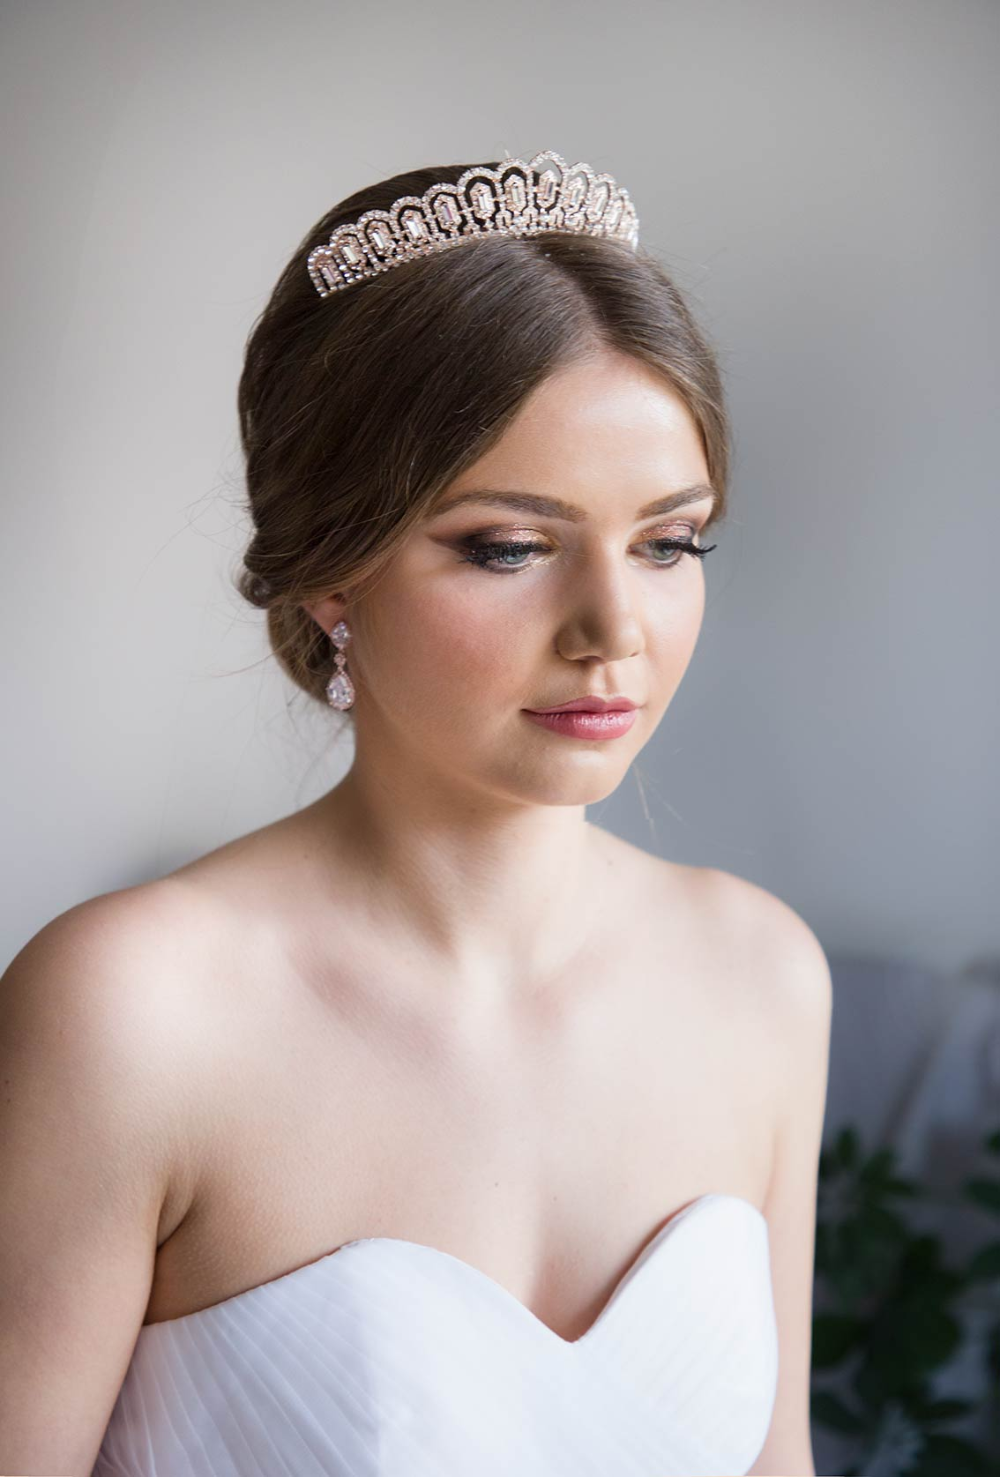 Diademe Mariage Princesse Cristal Accessoire De Cheveux De Luxe Miya Diademe Mariage Accessoires Cheveux Mariage Mariage Princesse